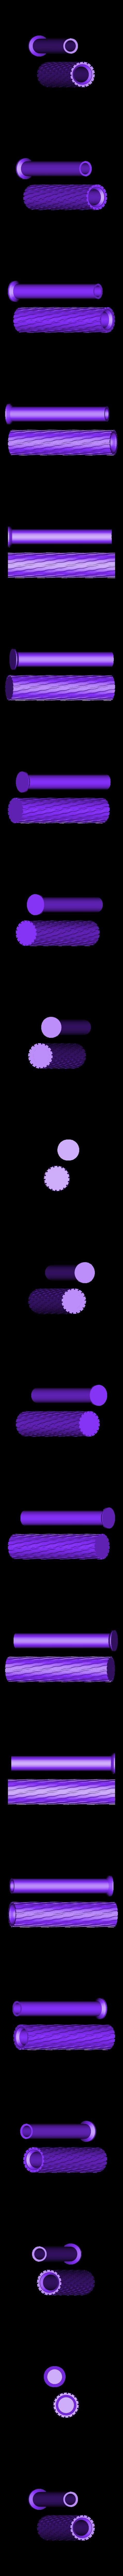 TubeQ_with_container.STL Download STL file Tube Q  • 3D print design, Ufon